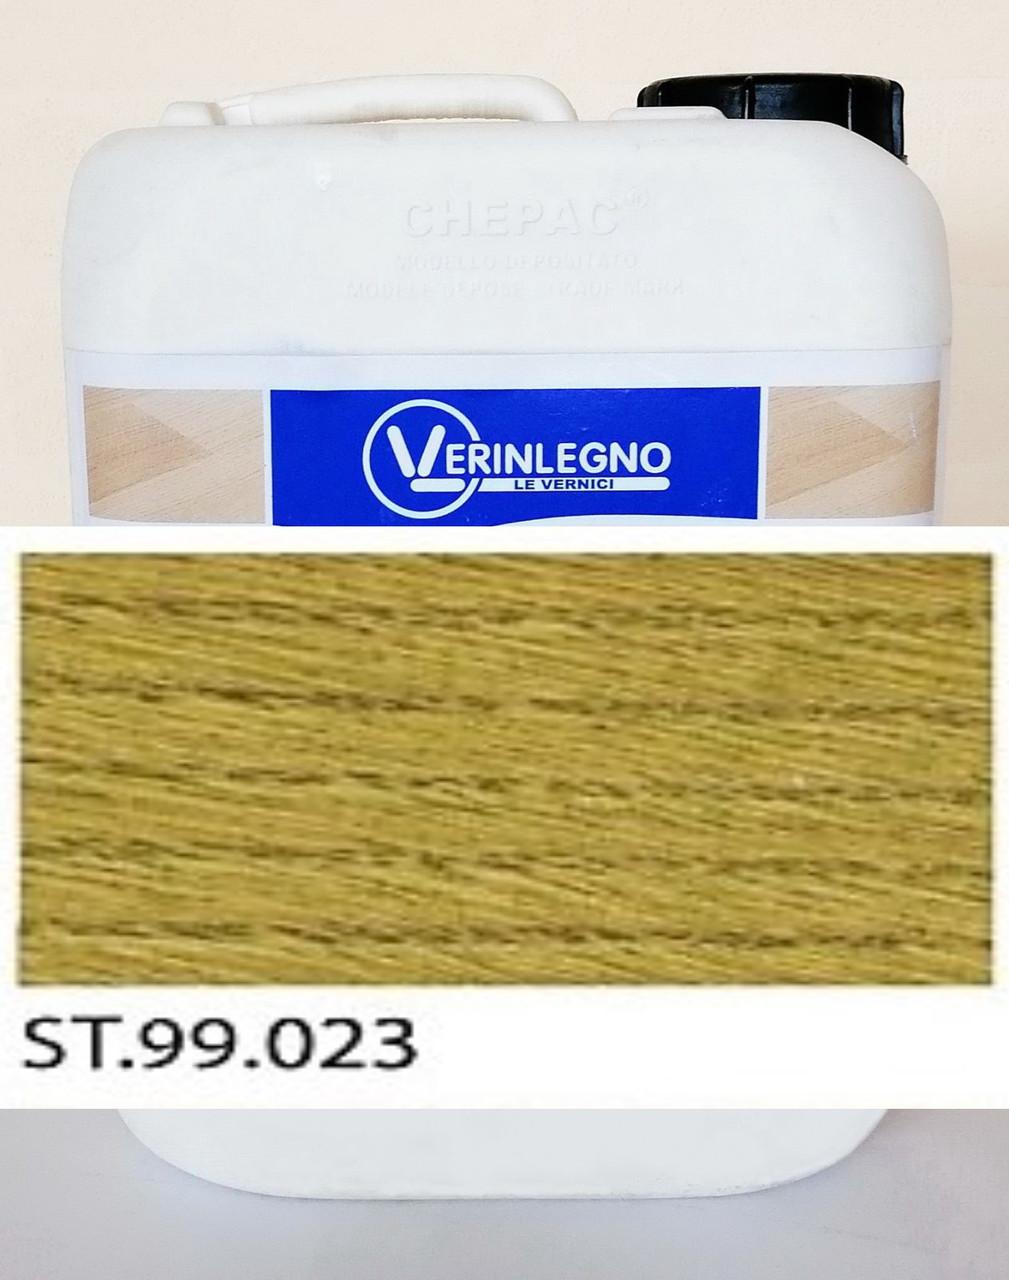 Краситель (морилка, пропитка, бейц)  для дерева VERINLEGNO ST.99.023, тара: 1л.